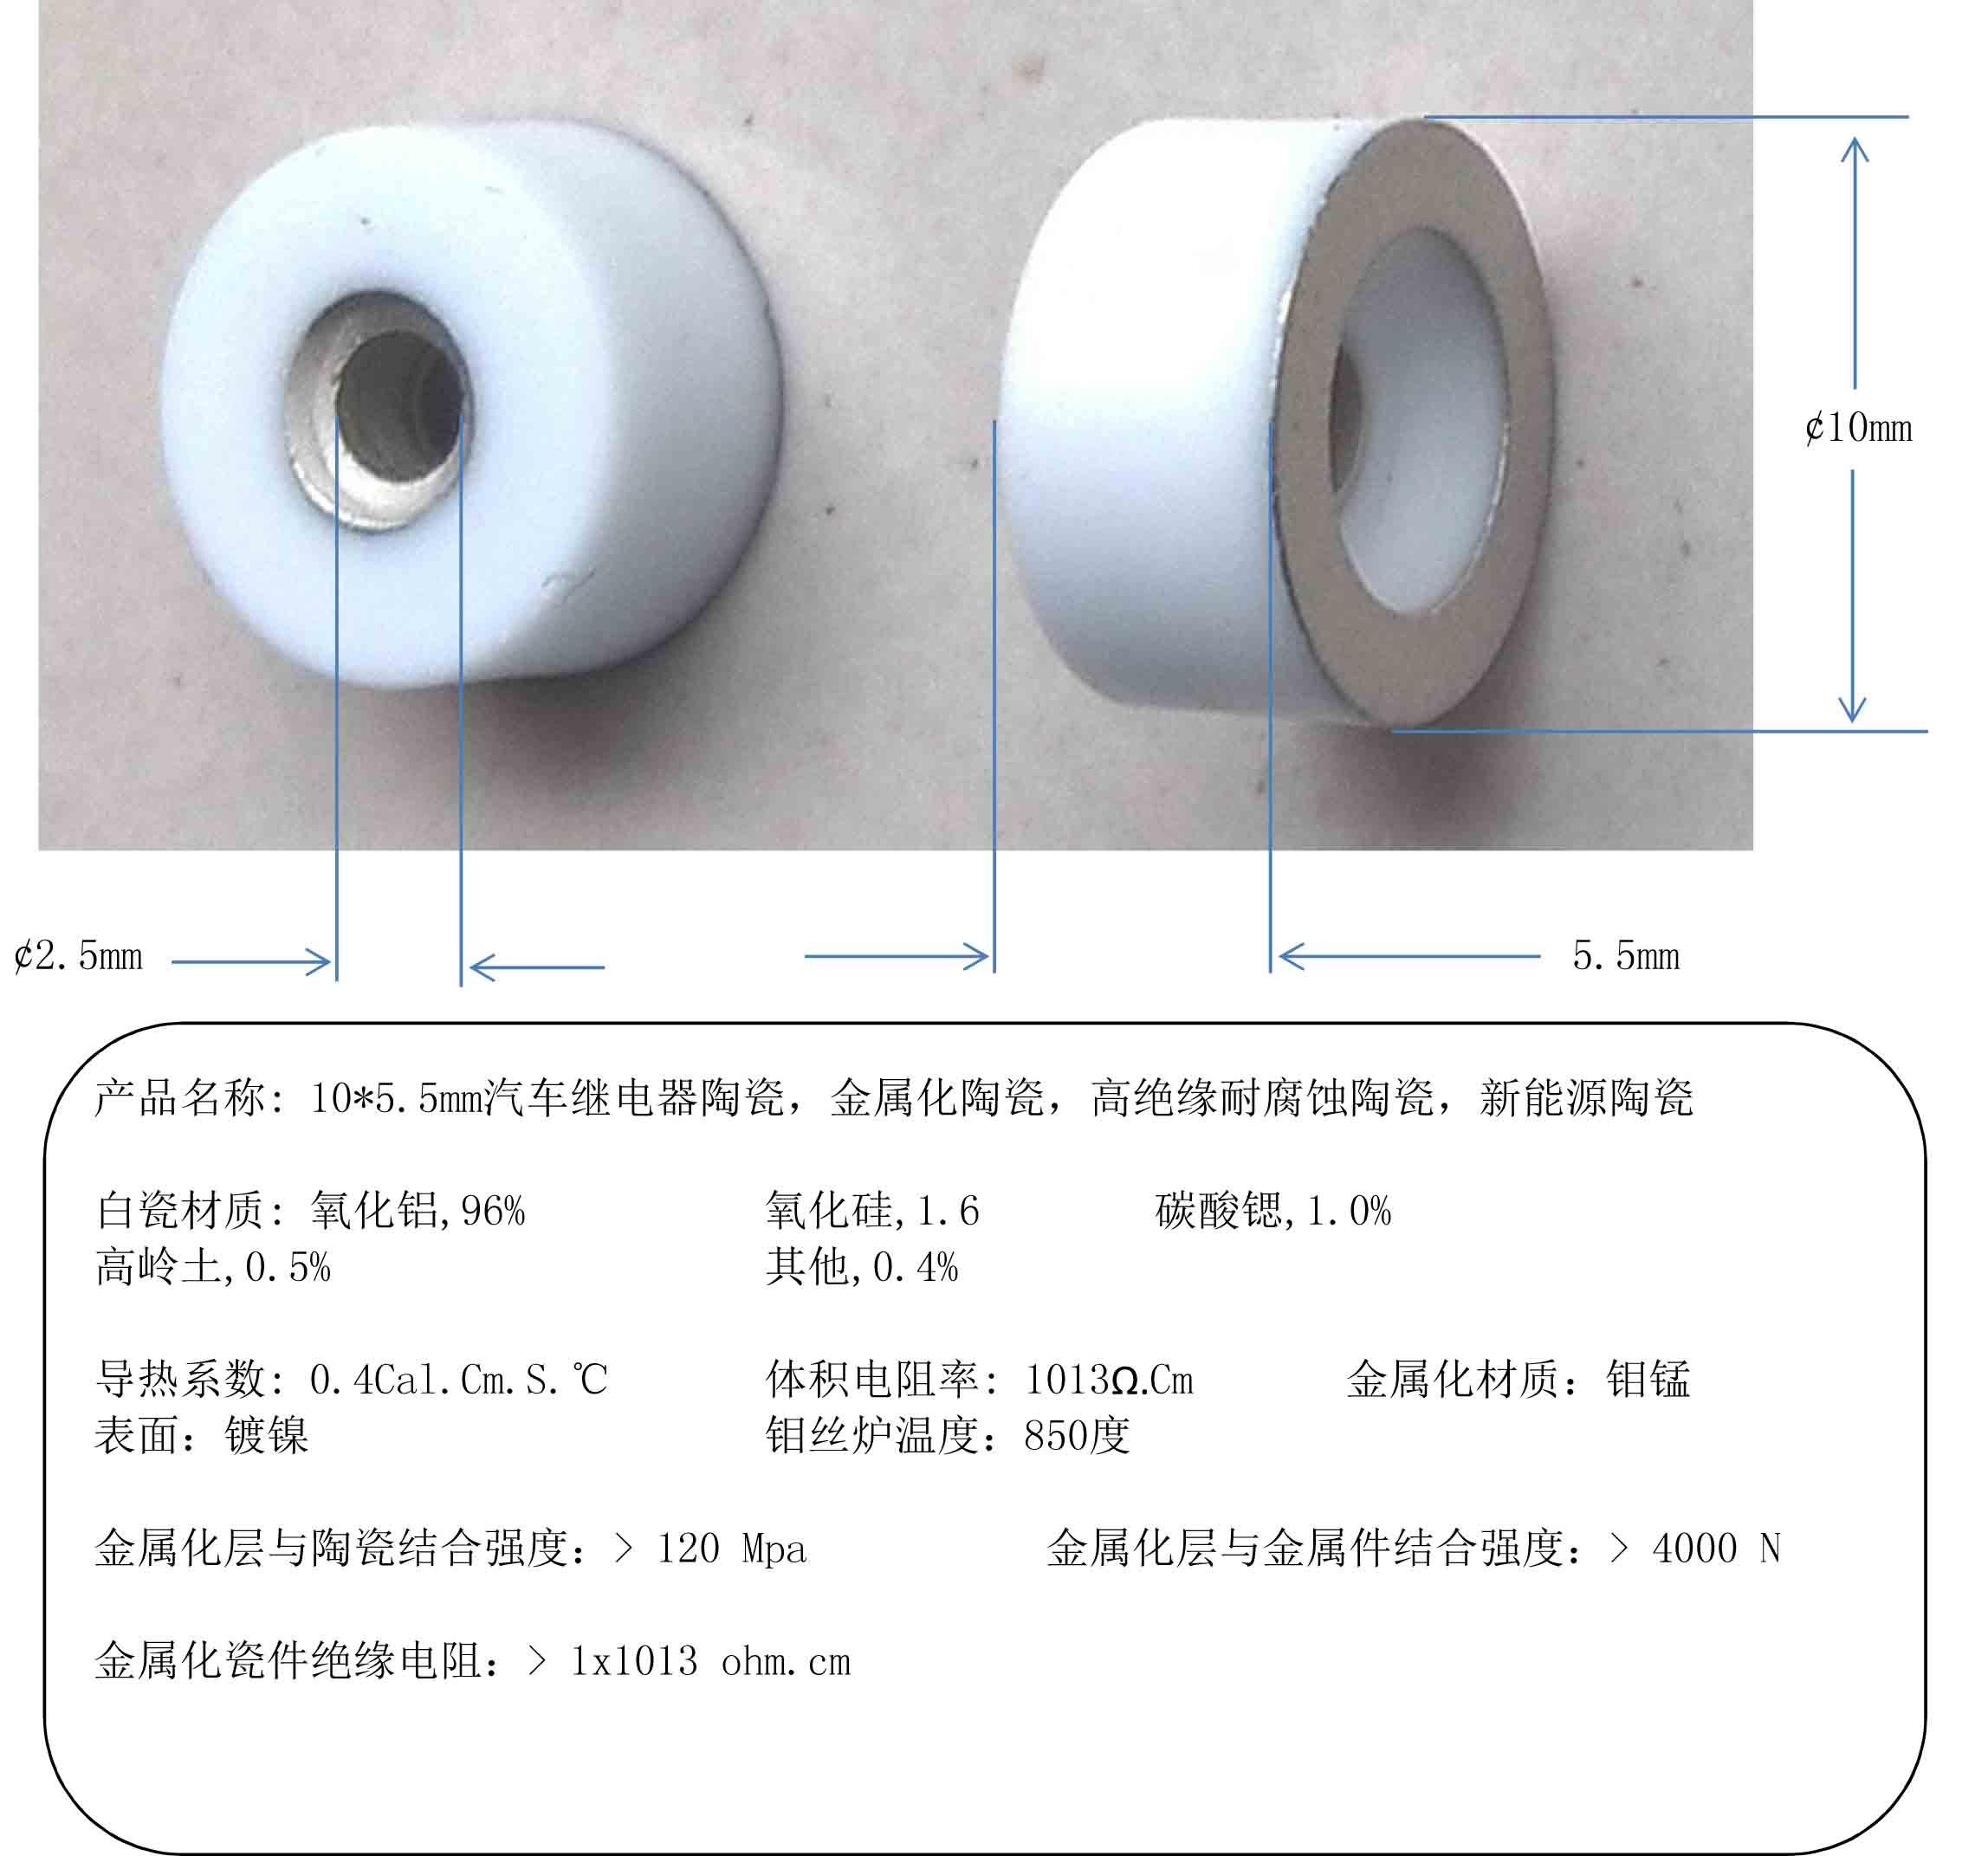 10*5.5mm automotive relay ceramic, metallized ceramic, high insulation ceramics 2015 new arrival 12v 12volt 40a auto automotive relay socket 40 amp relay